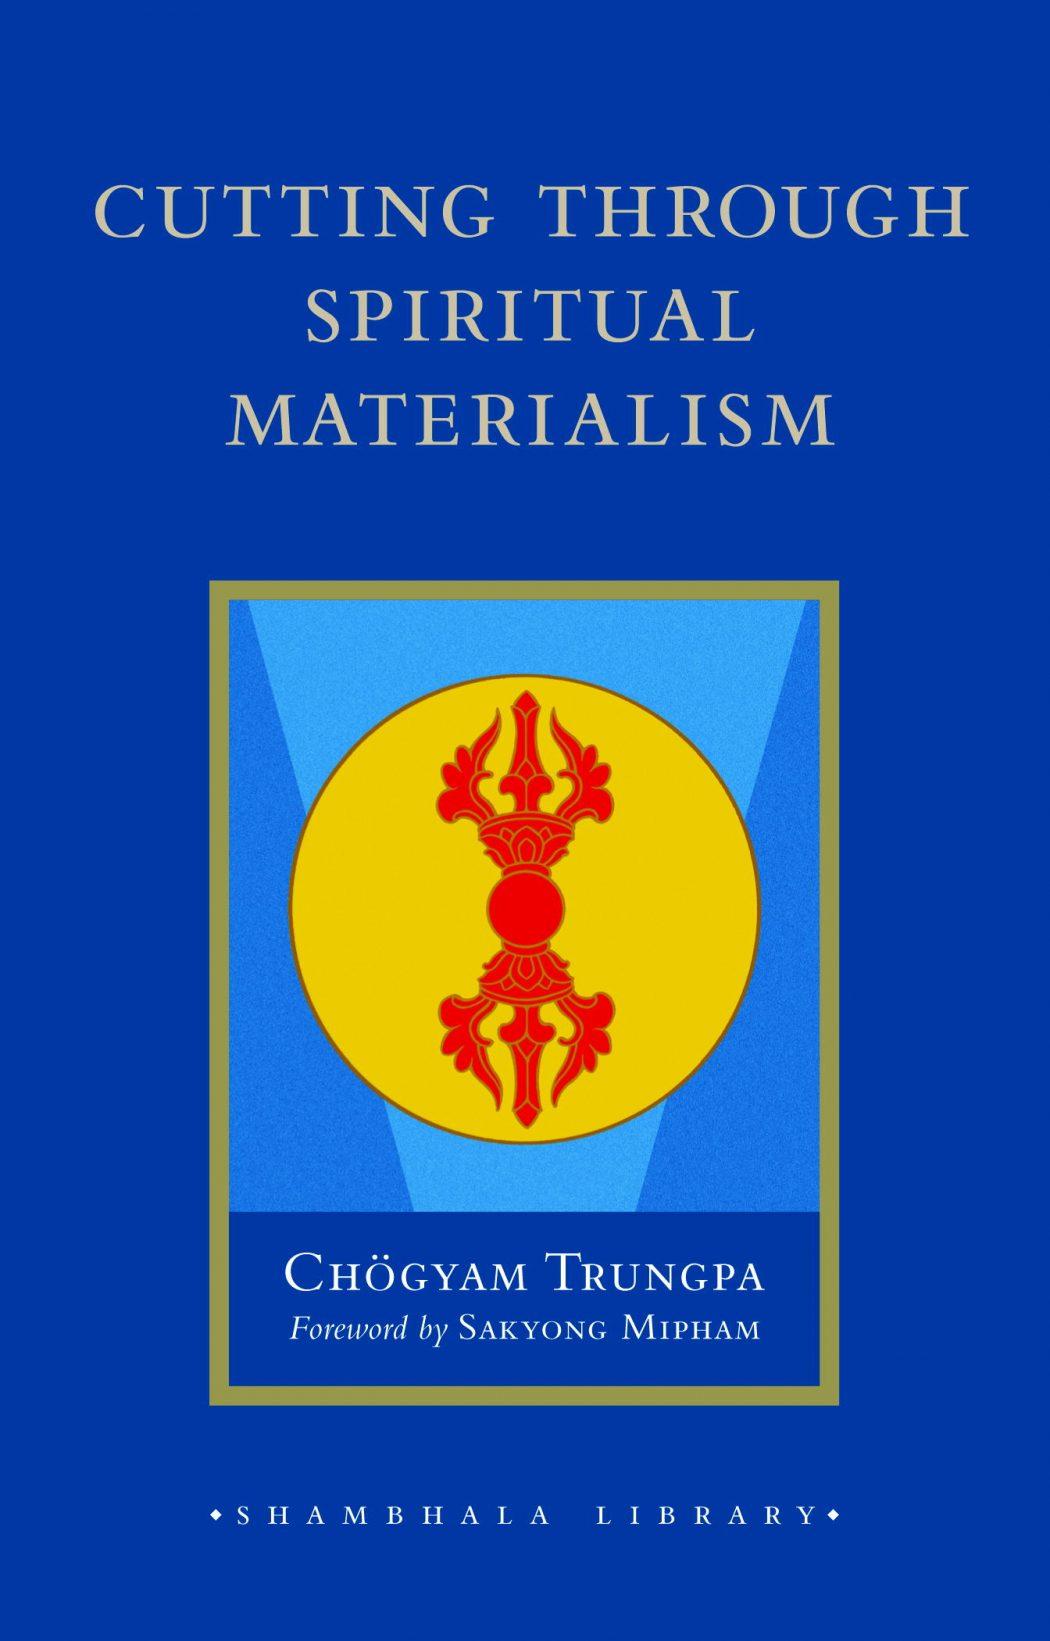 BOOKS-cutting-thru-spiritual-materialism Top 10 Best Recommendation Books From Steve Jobs